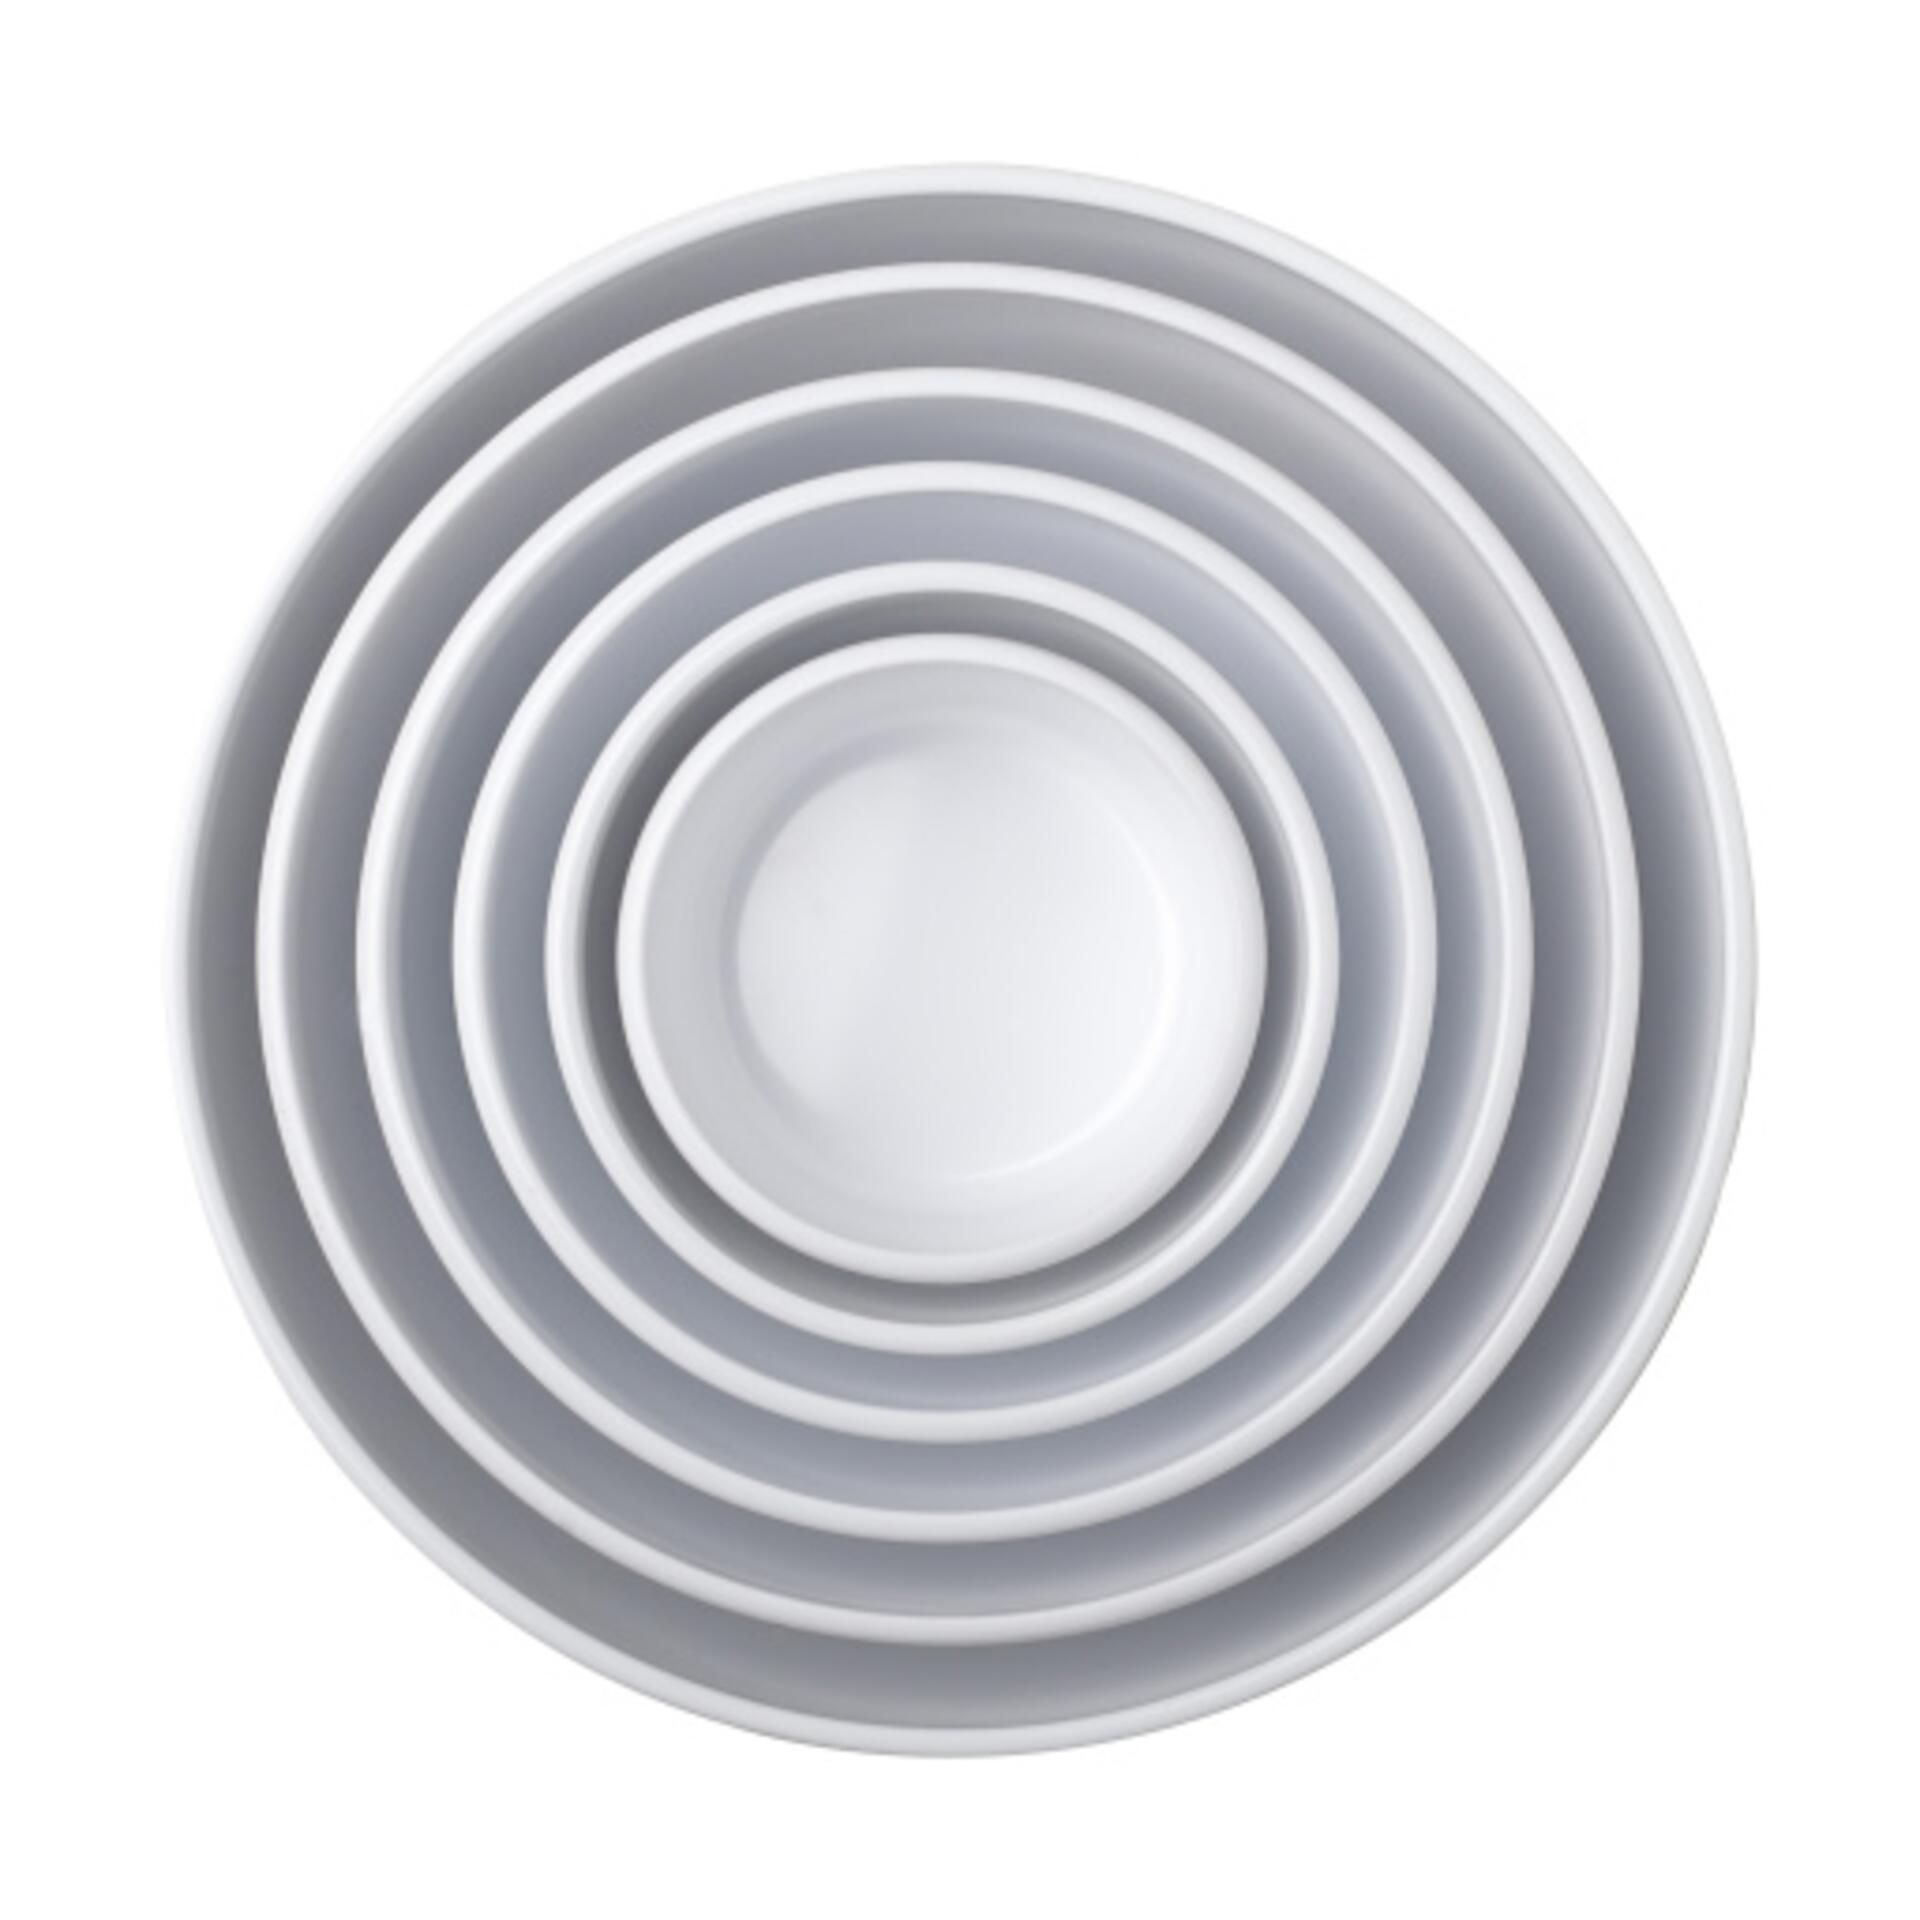 Rosti Mepal Volumia Aufbewahrung 3 l Grau